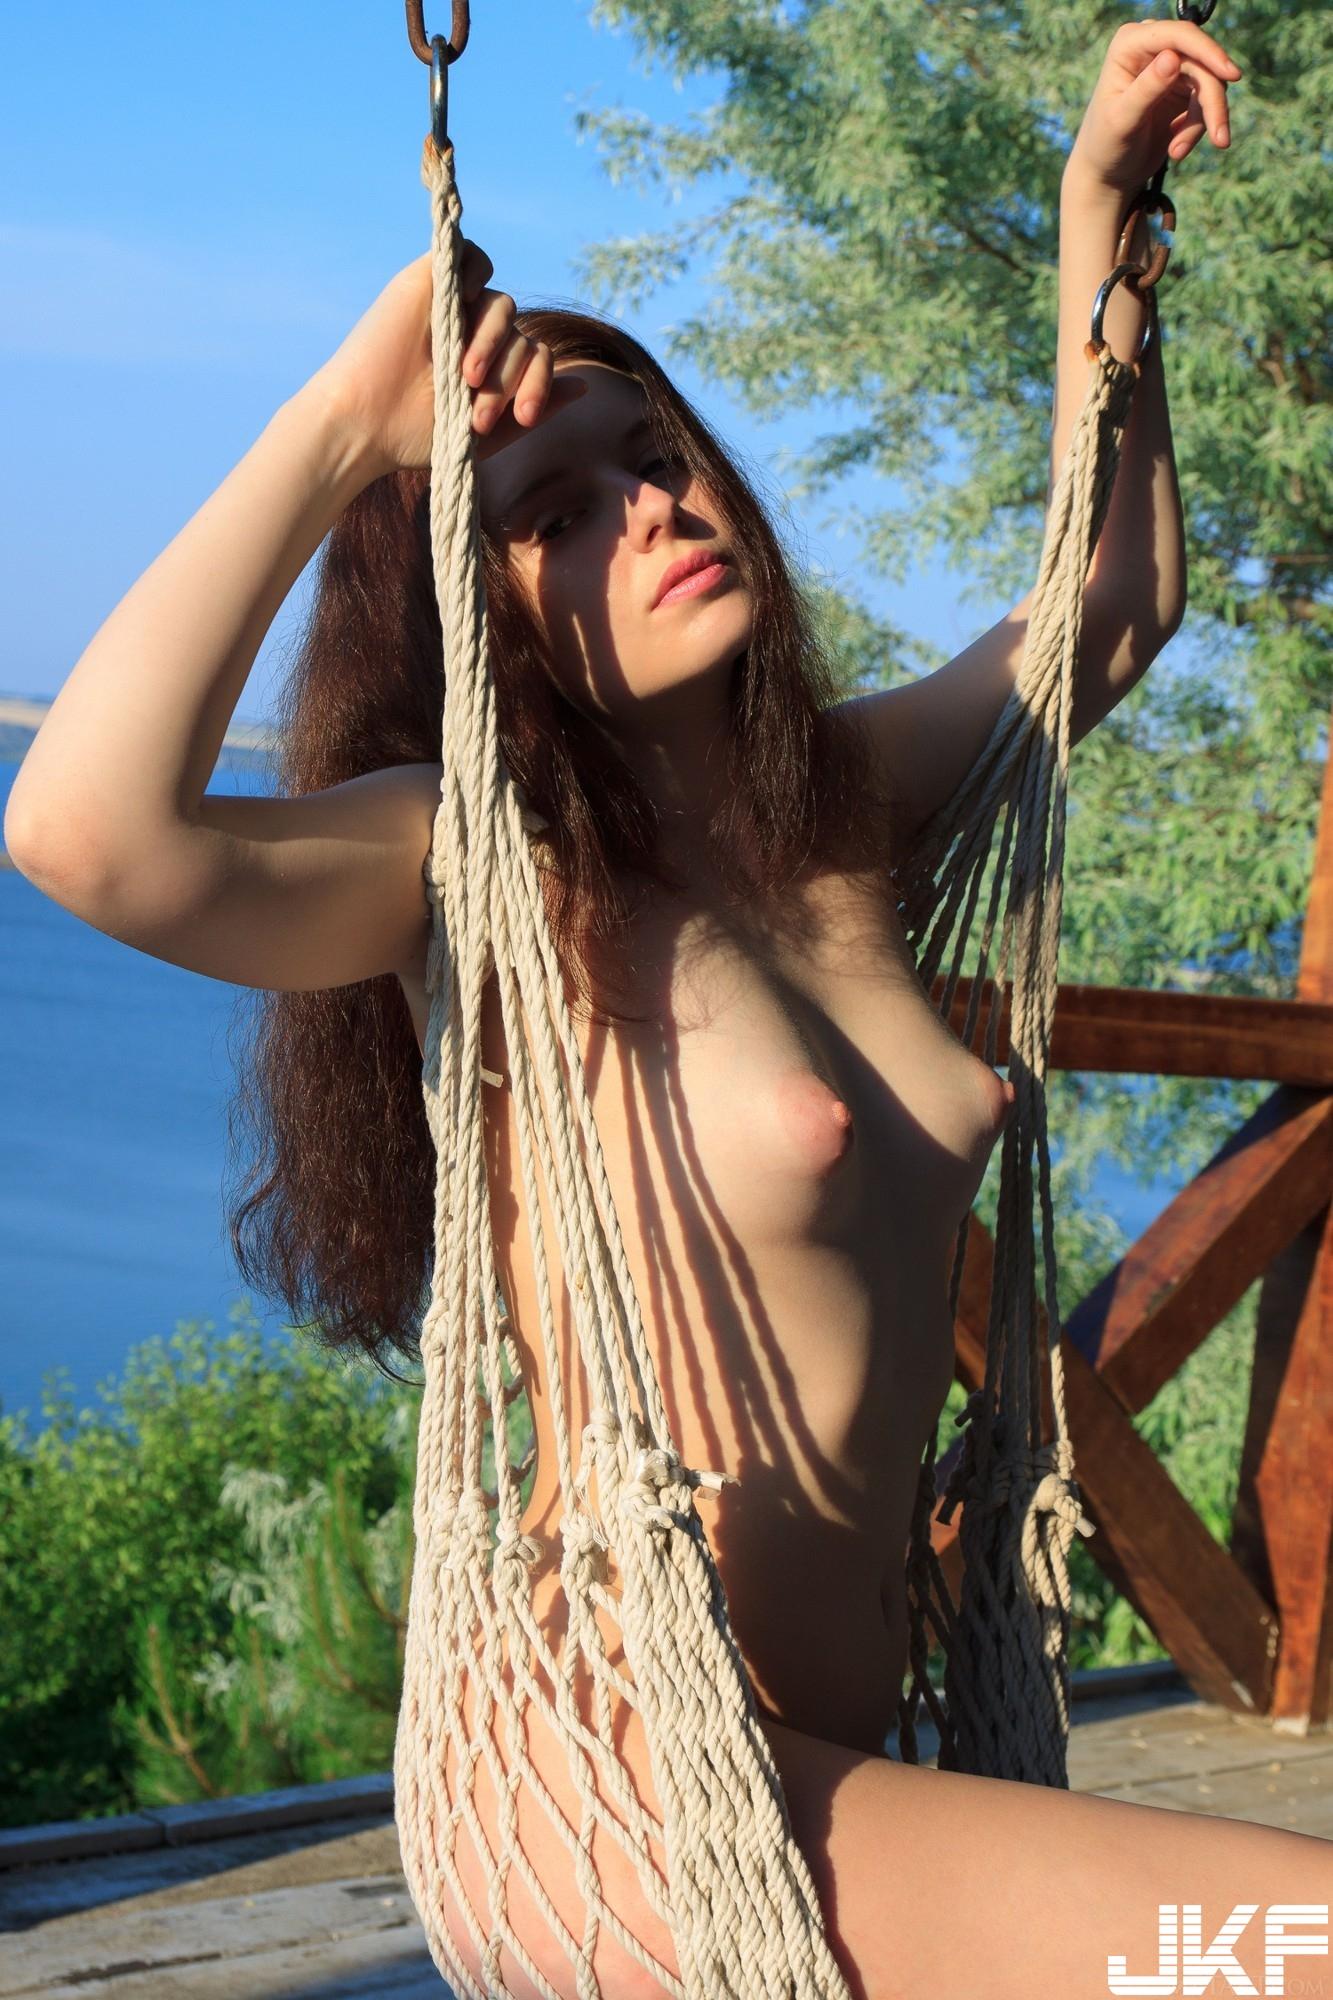 Sienna -Paradise- By Rylsky - 貼圖 - 歐美寫真 -